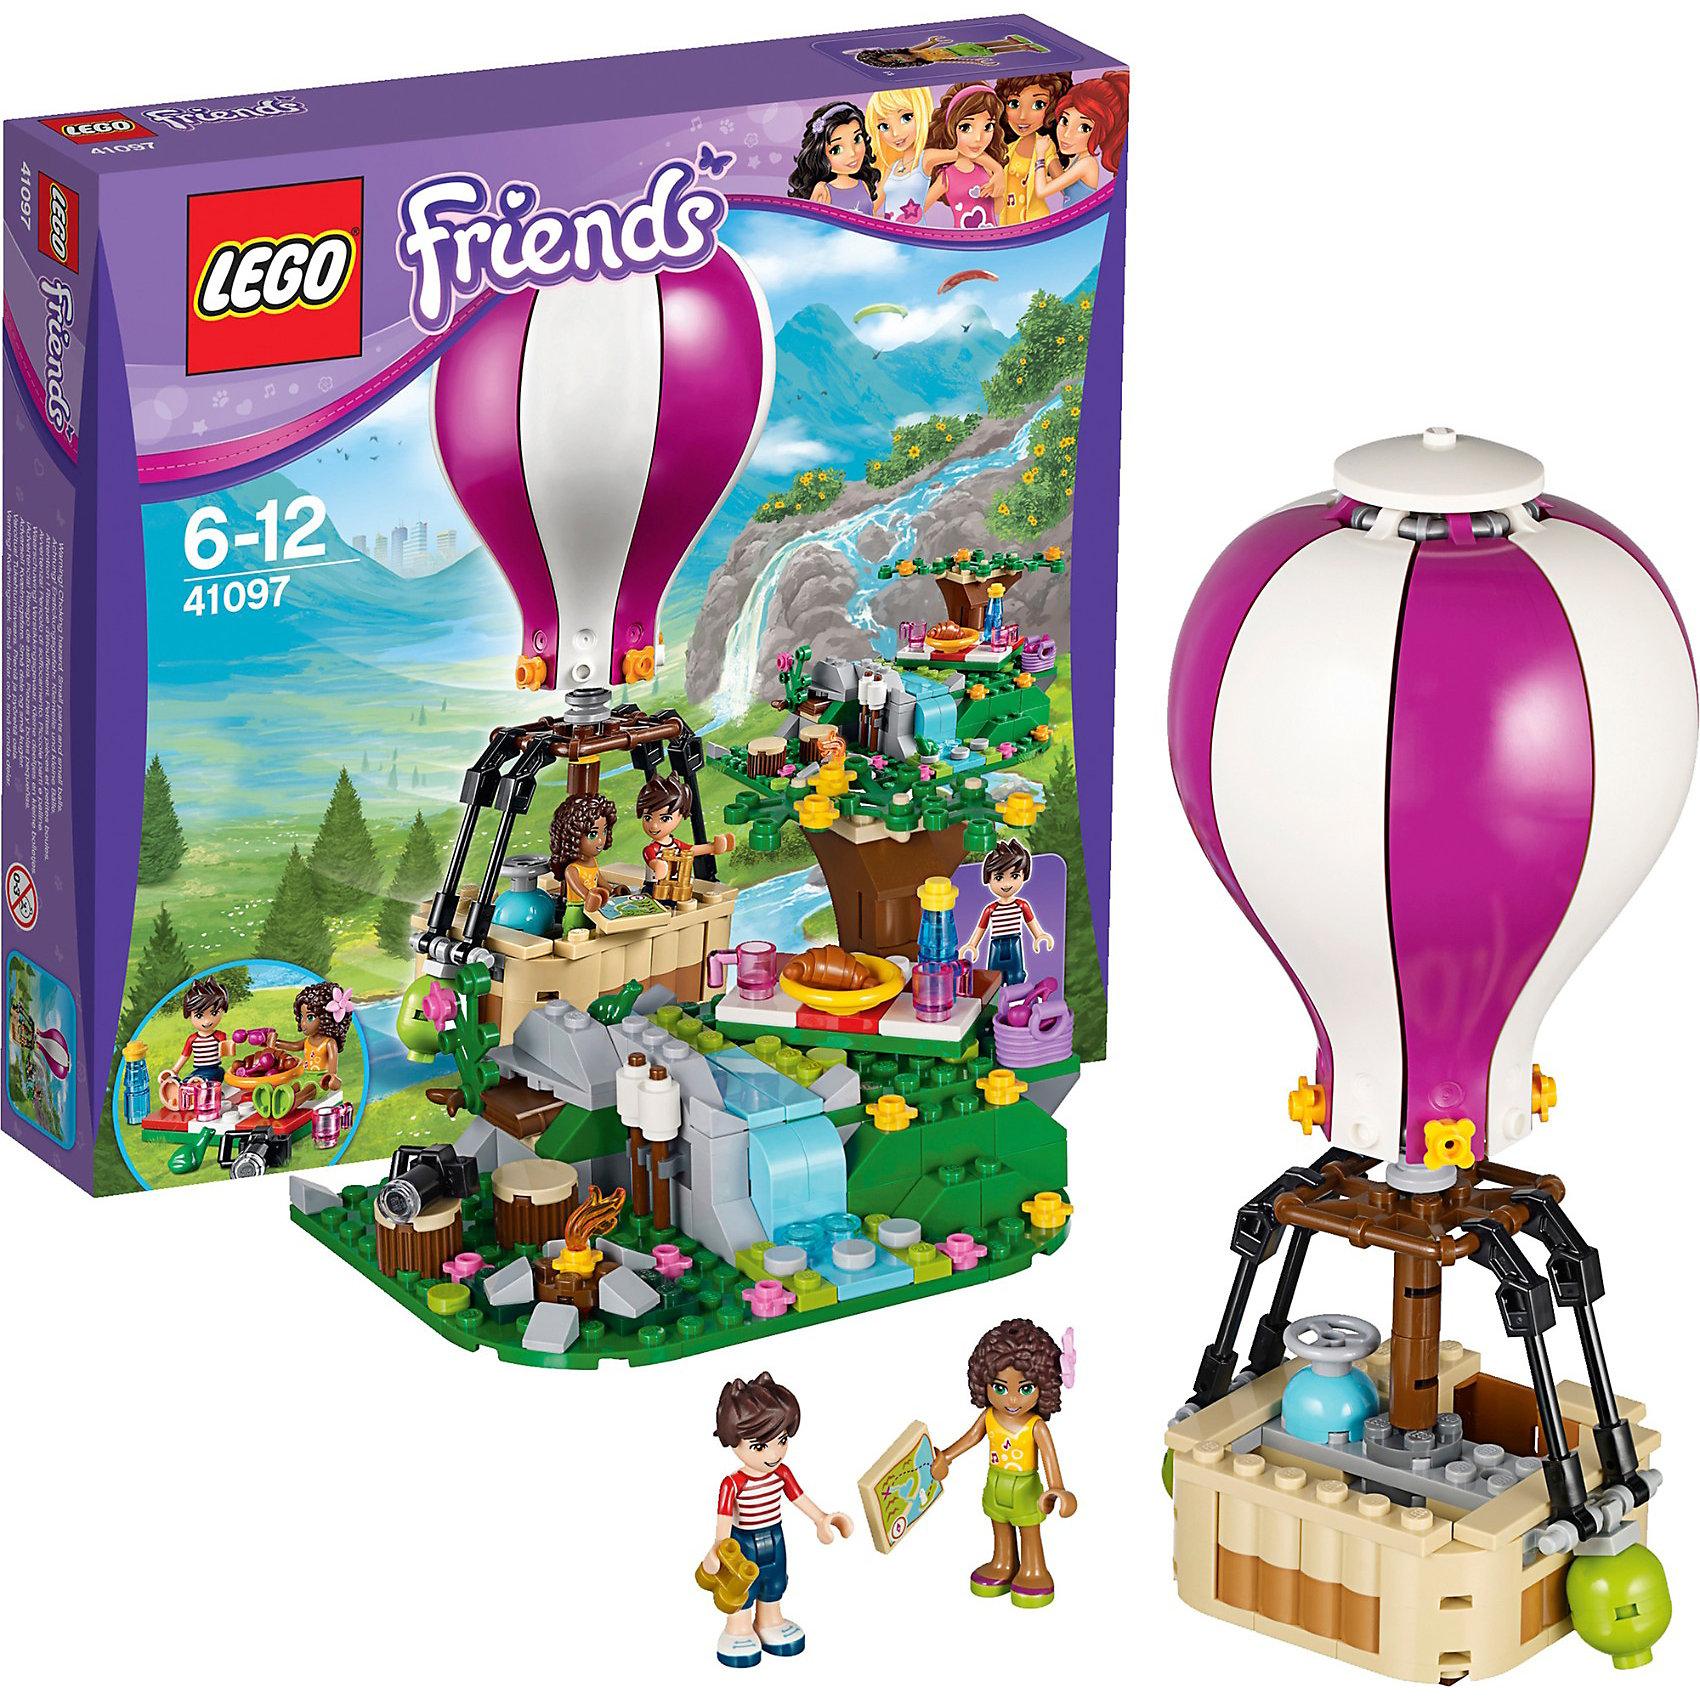 LEGO LEGO Friends 41097: Воздушный шар книга lego lego 978 5 699 78042 6 книга поймай шпиона с мини набором